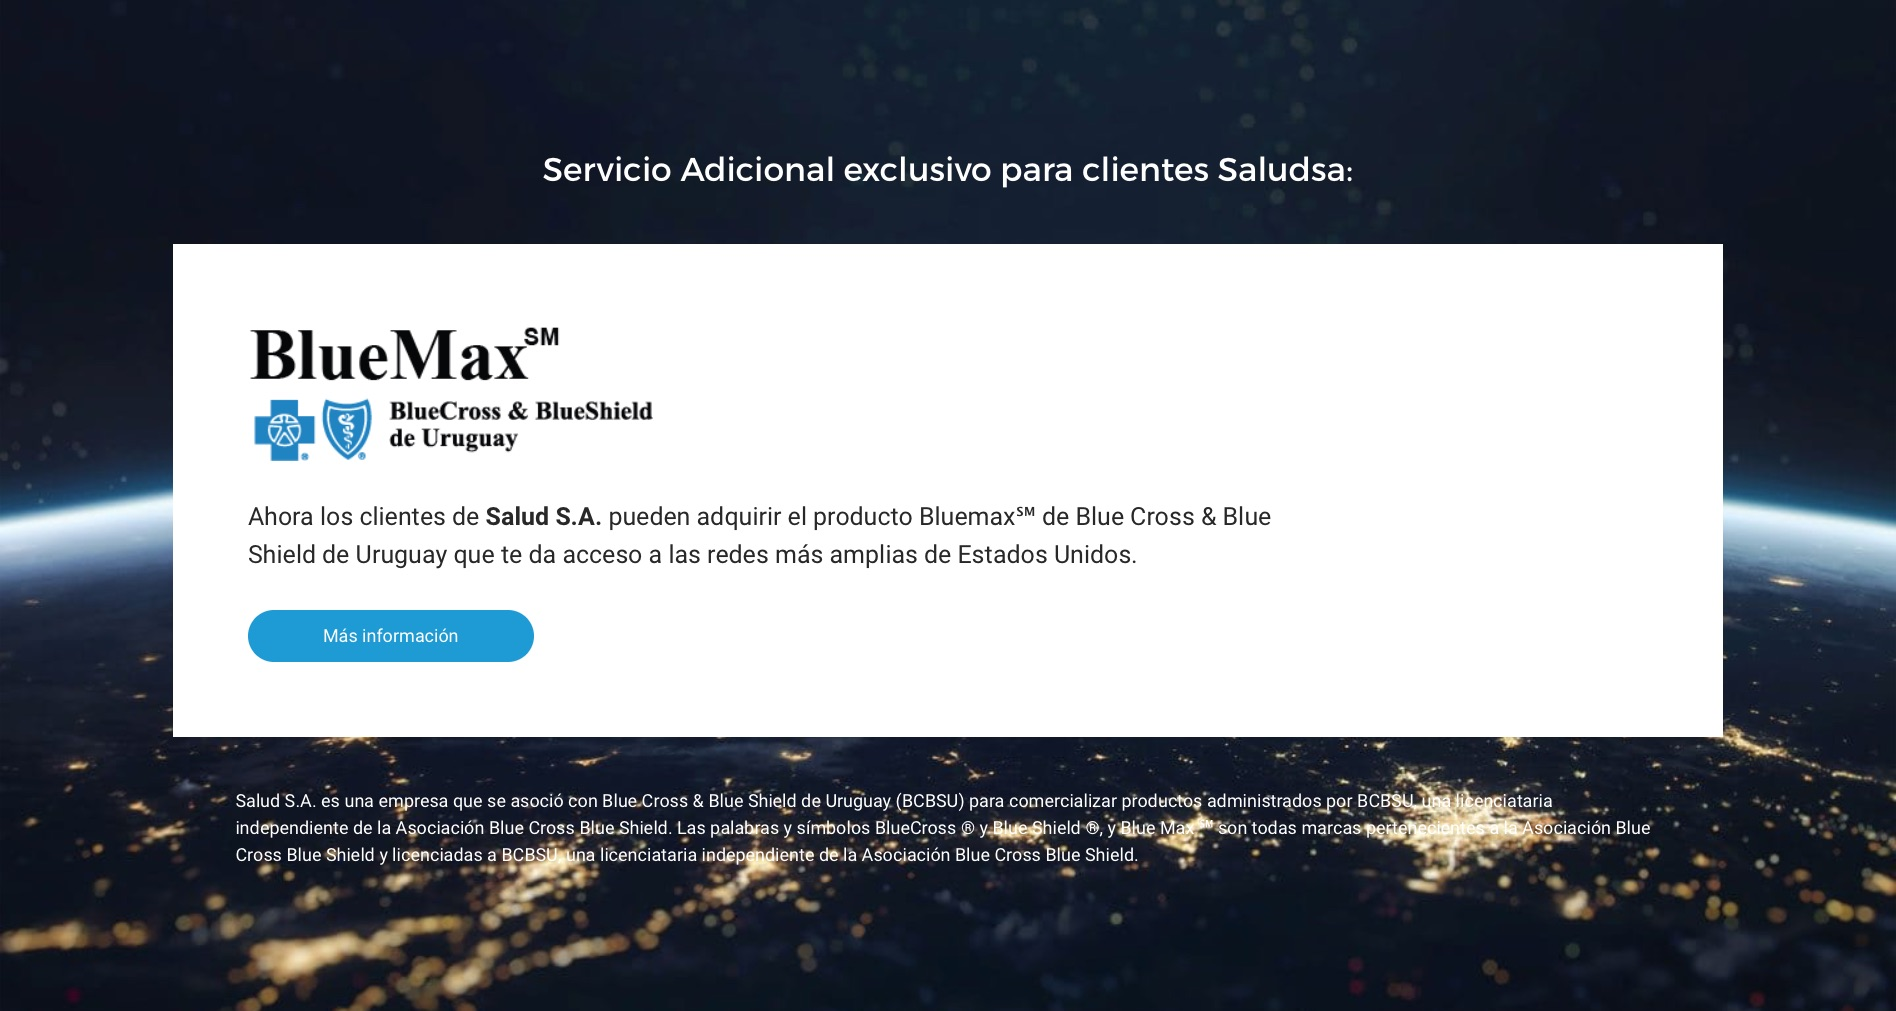 bluemax.jpg